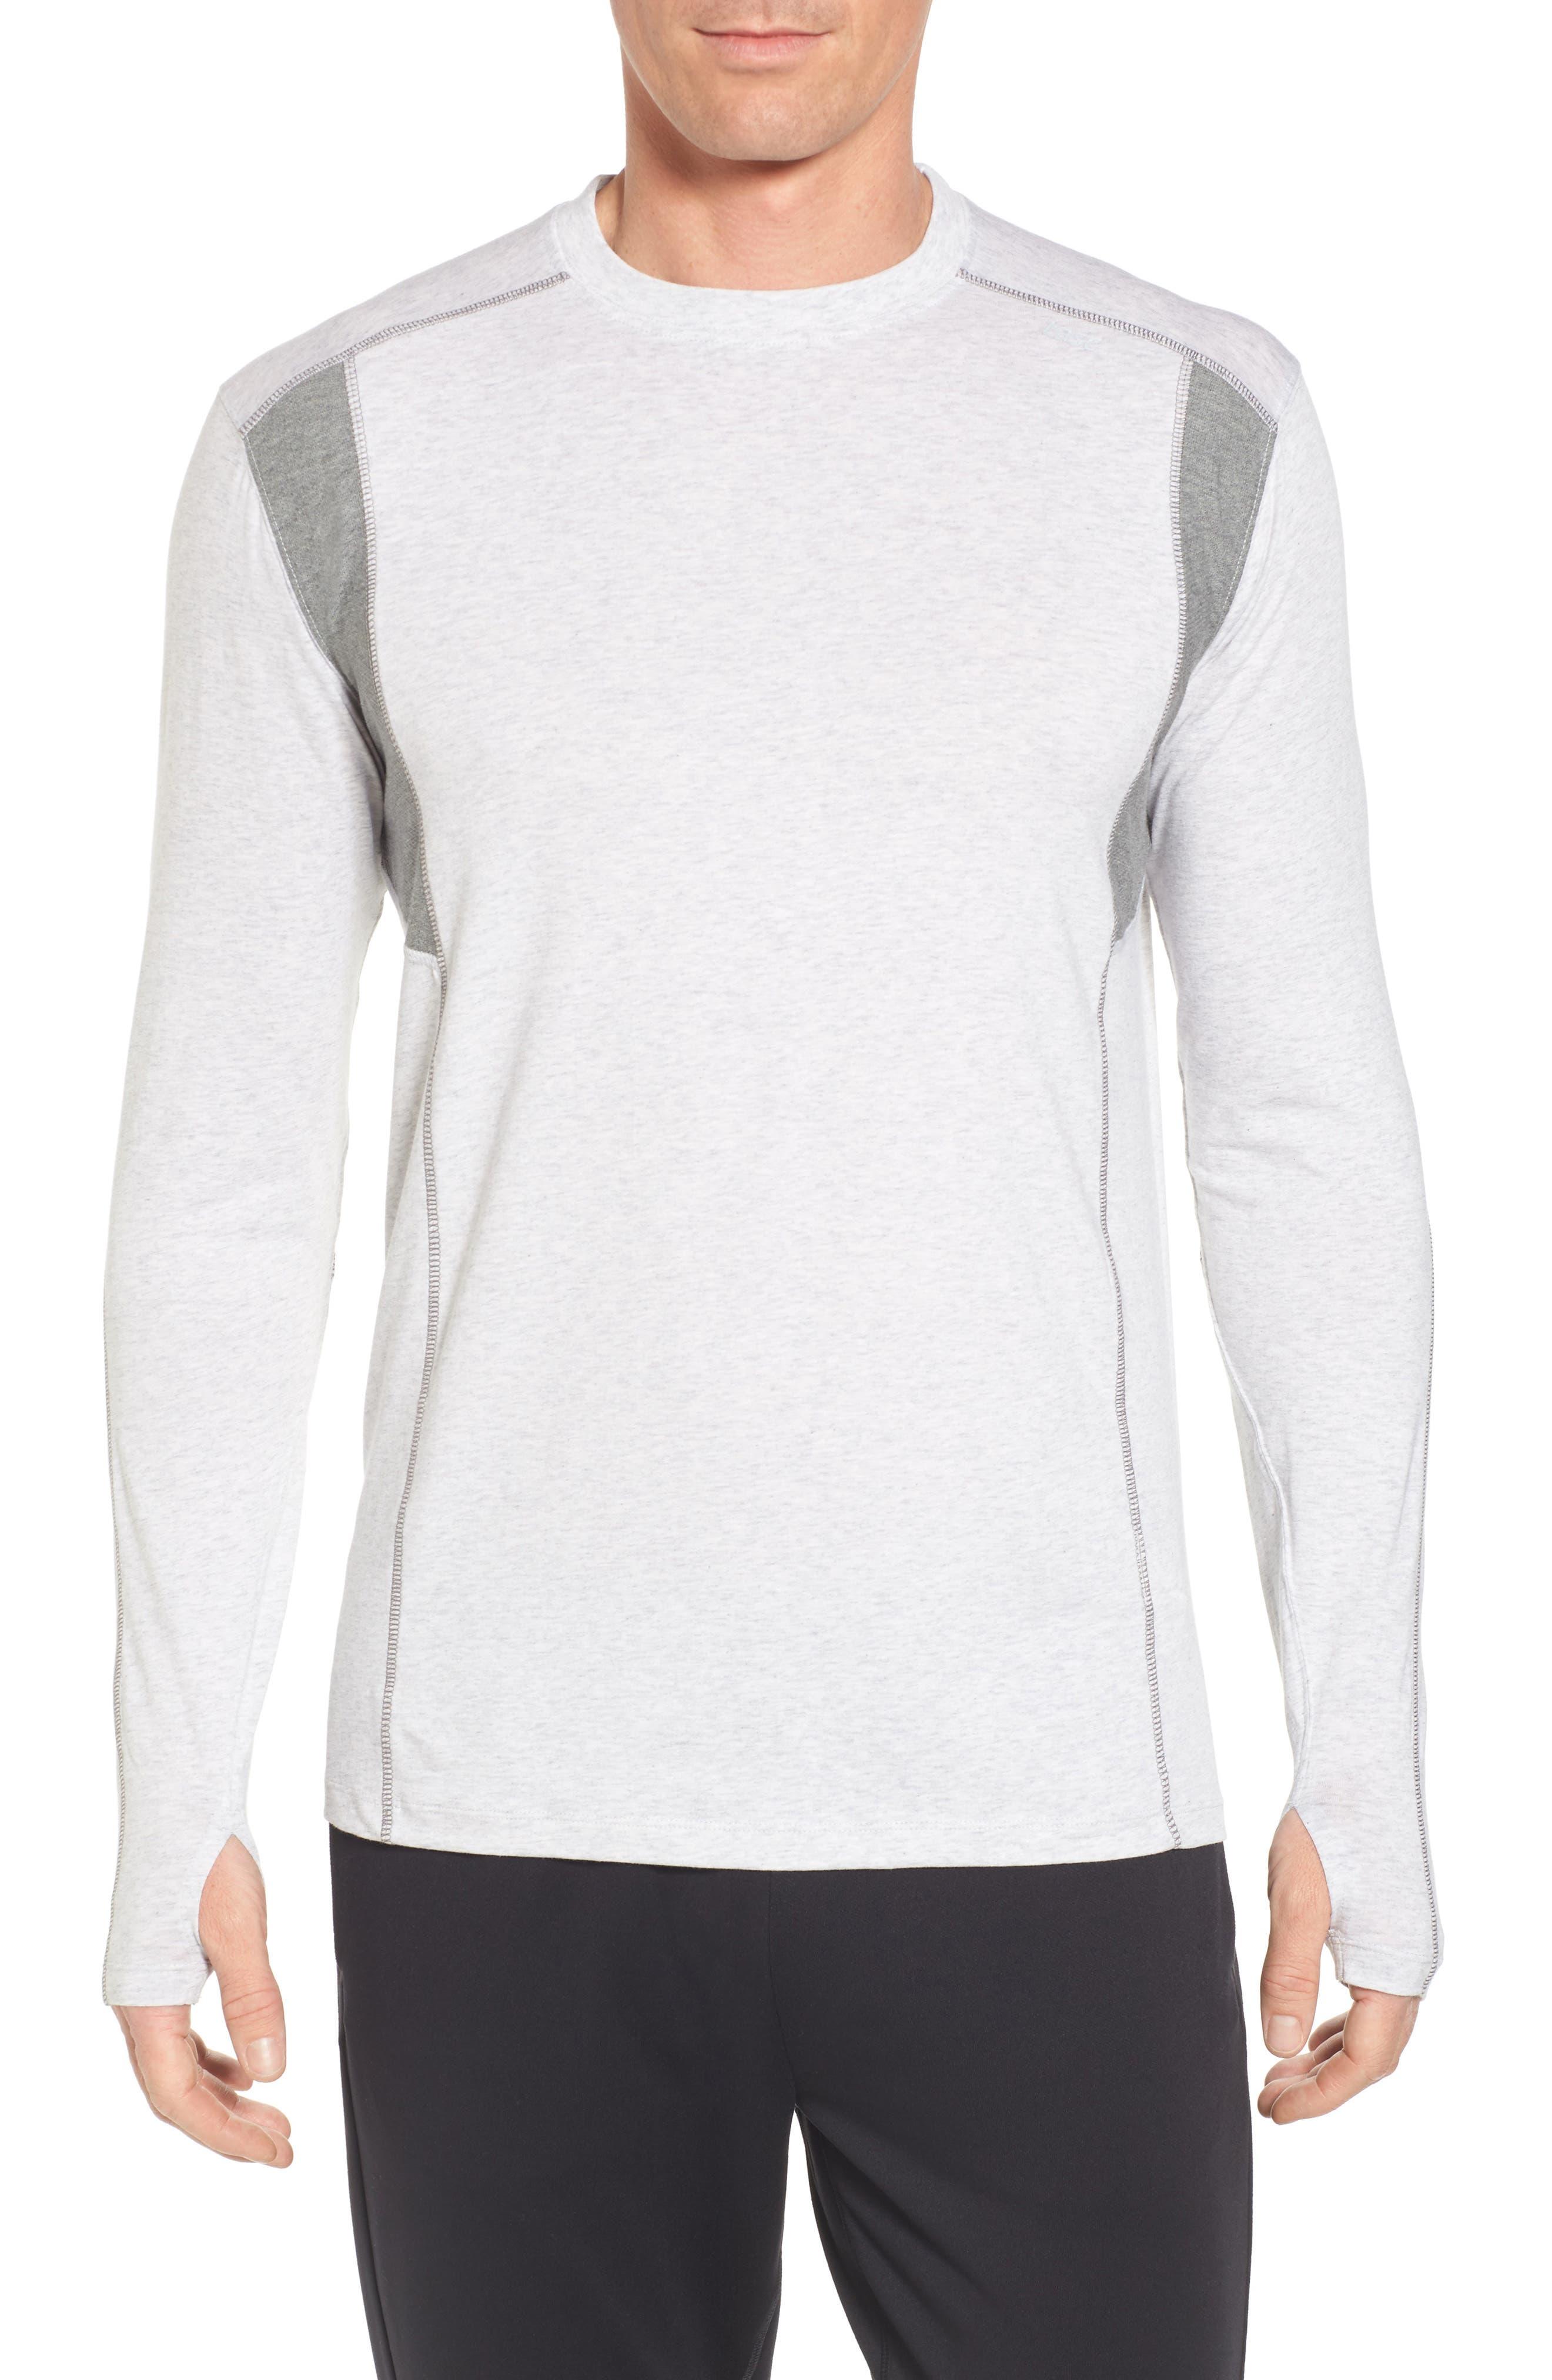 Charge Sweatshirt,                         Main,                         color, Light Heather Gray